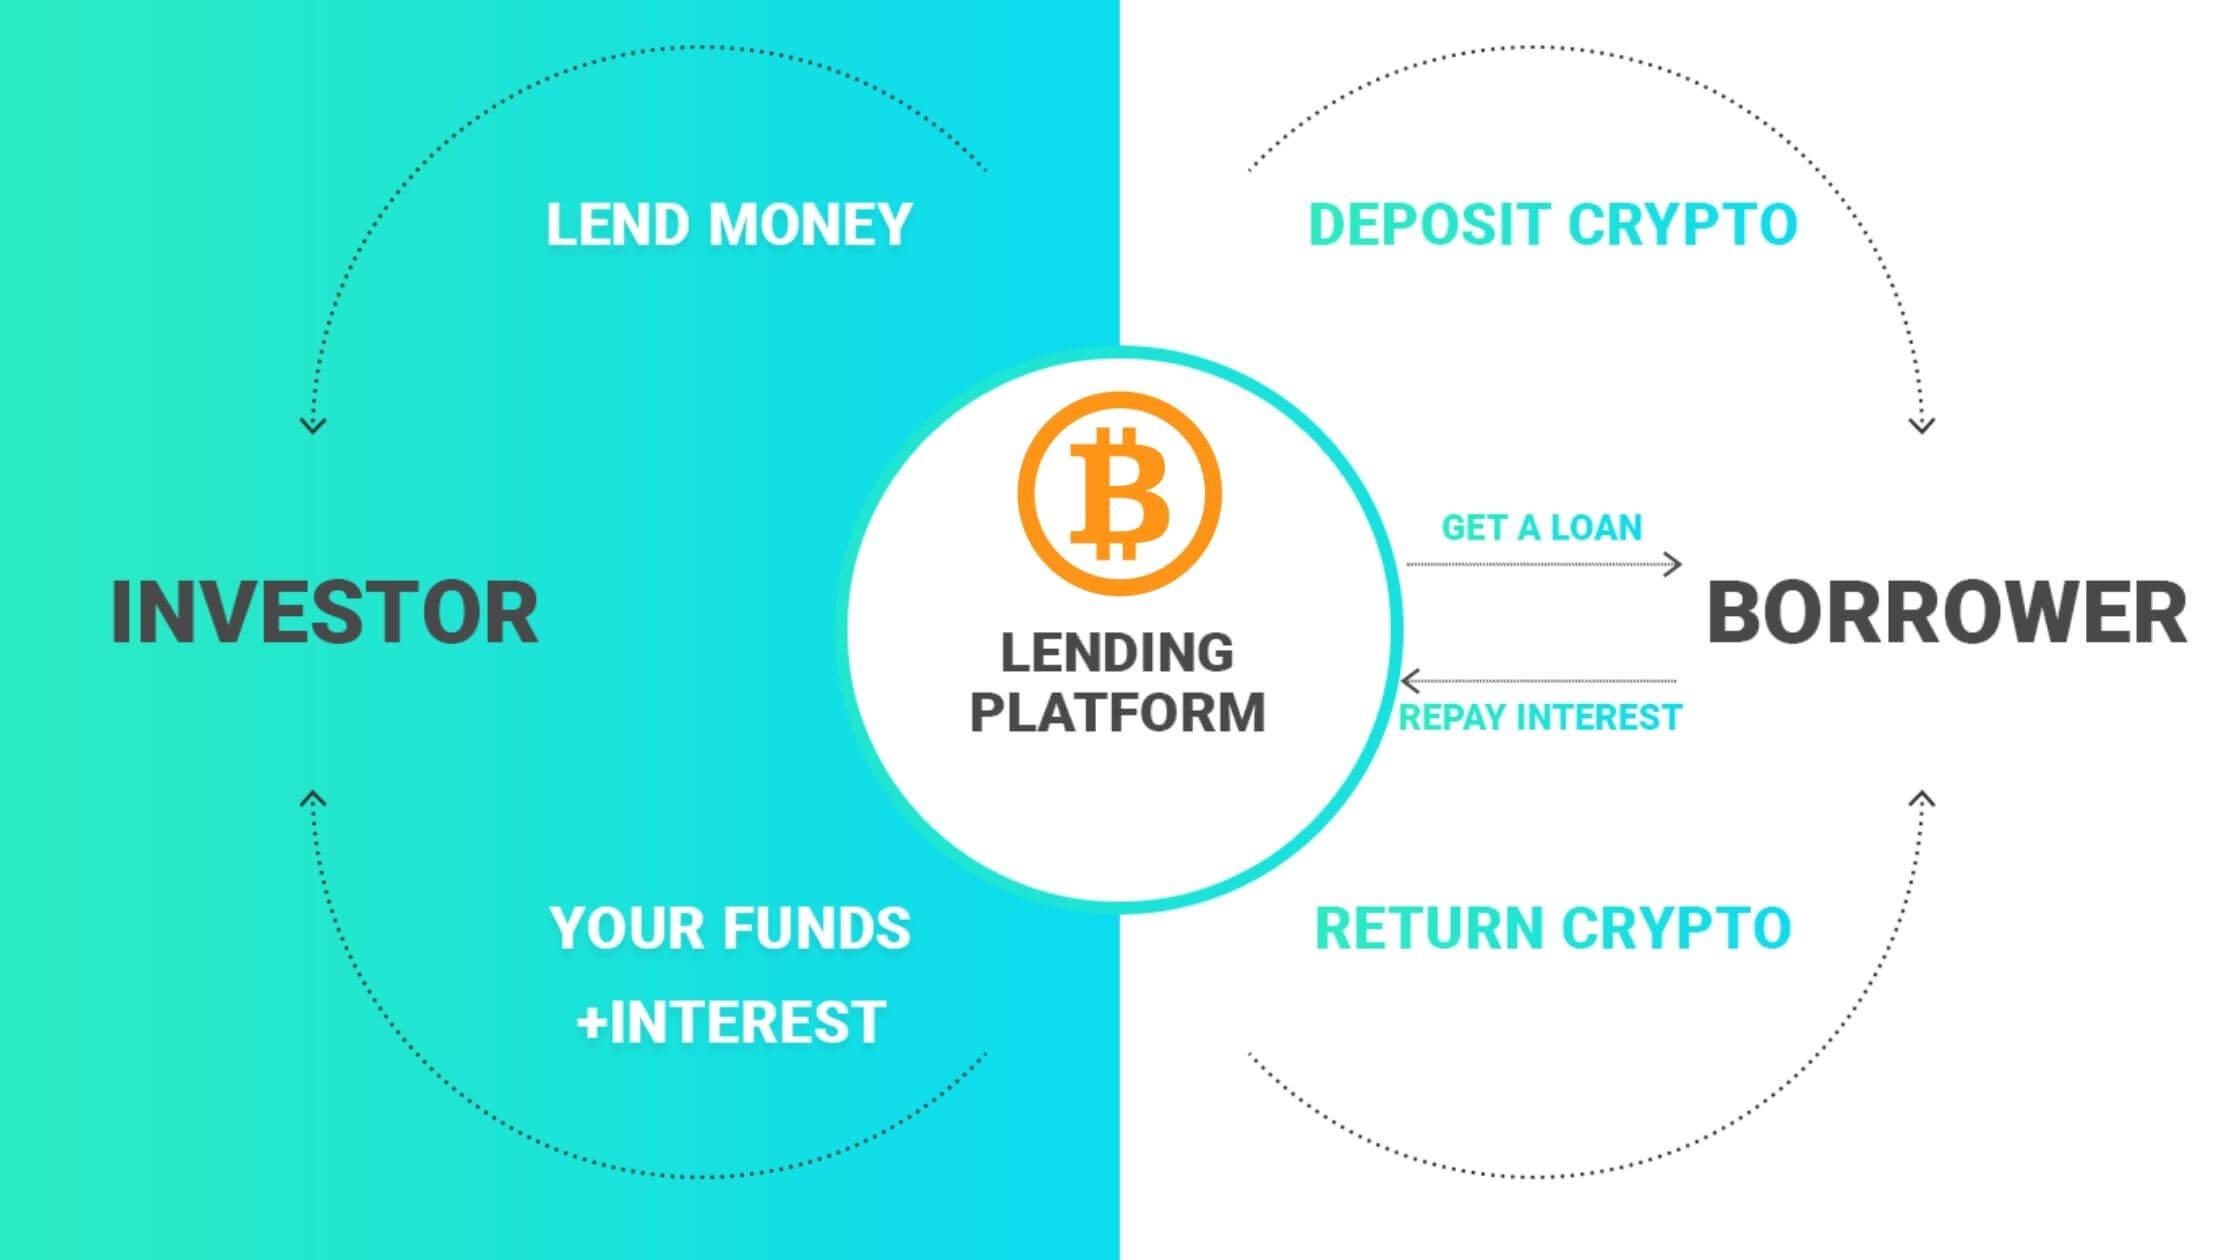 Bitcoin Lending Overview